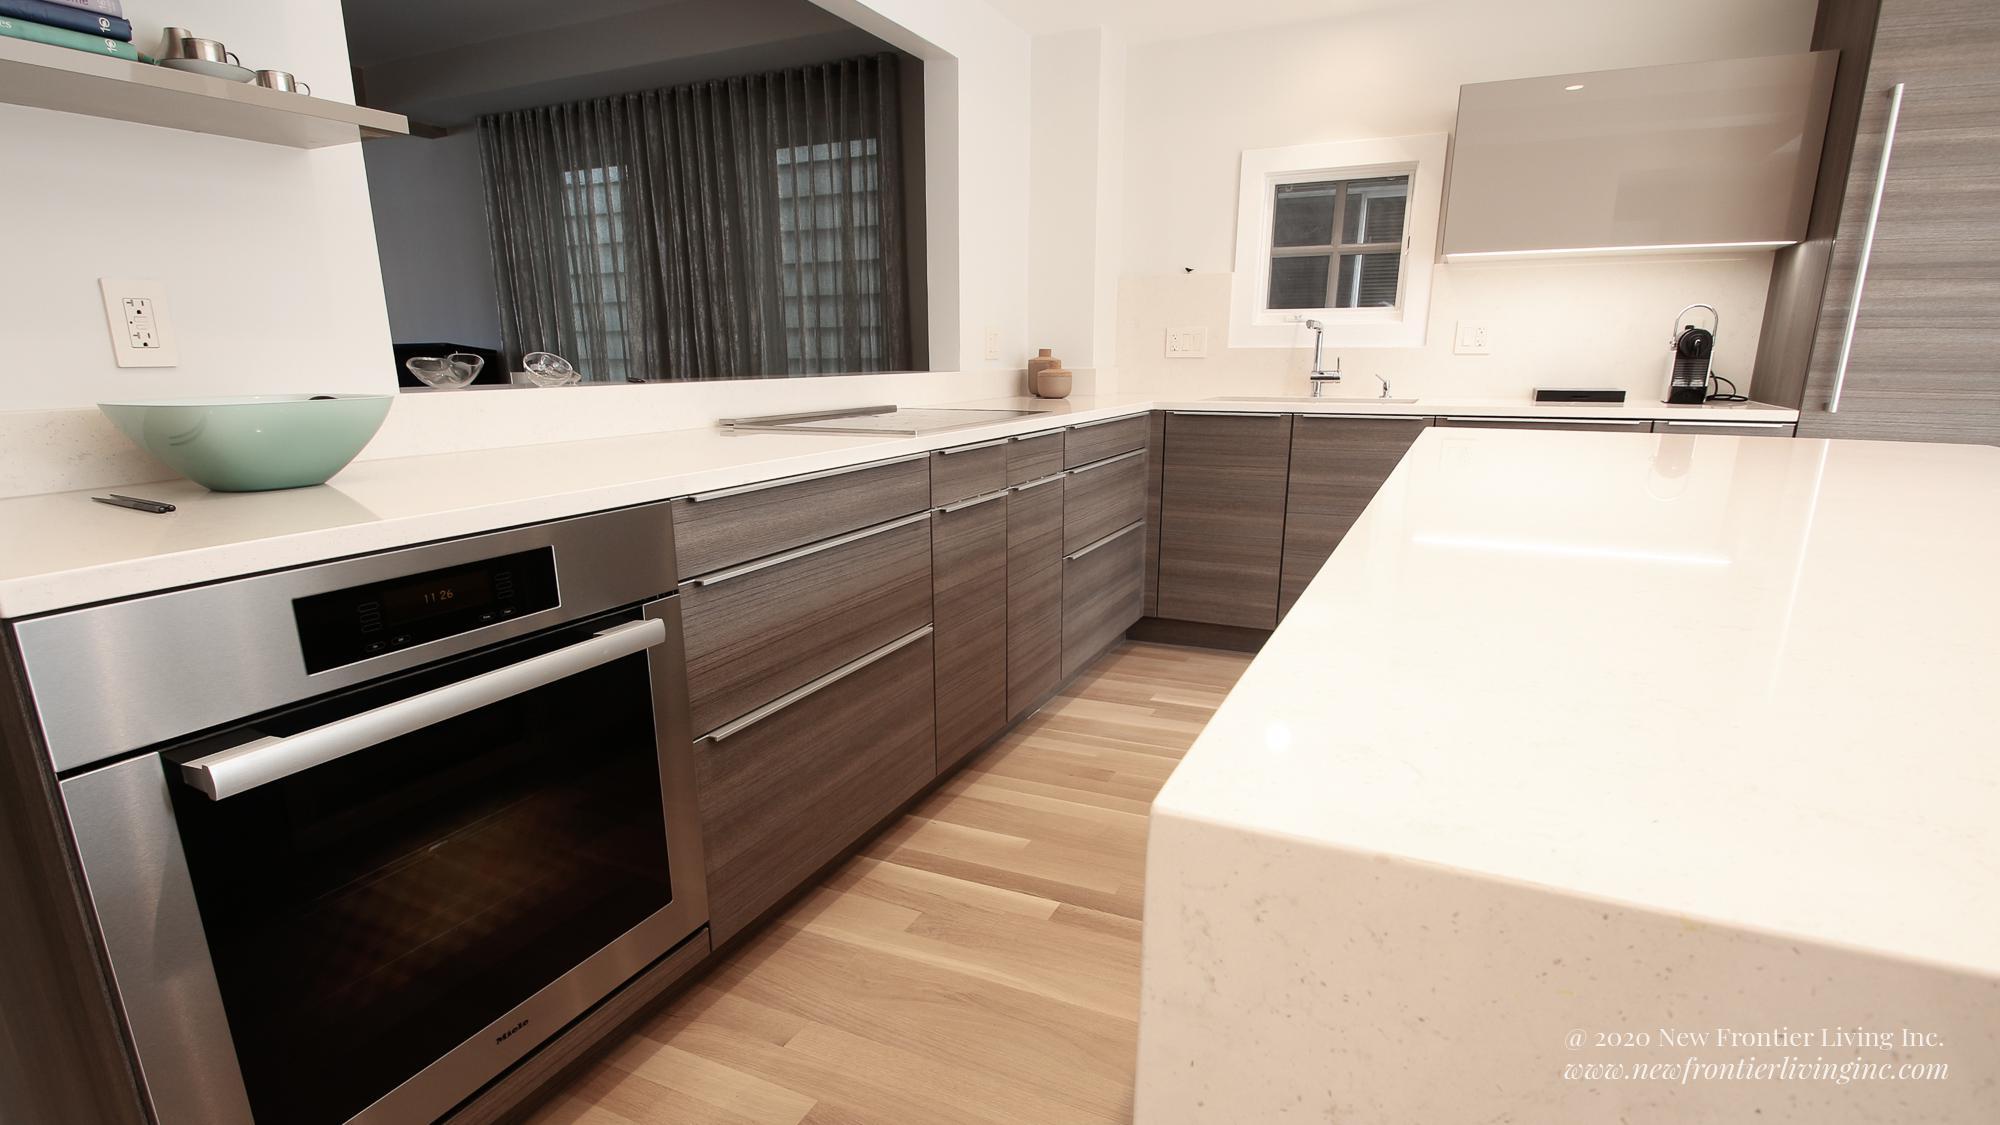 Dark brown kitchen cabinets and oven